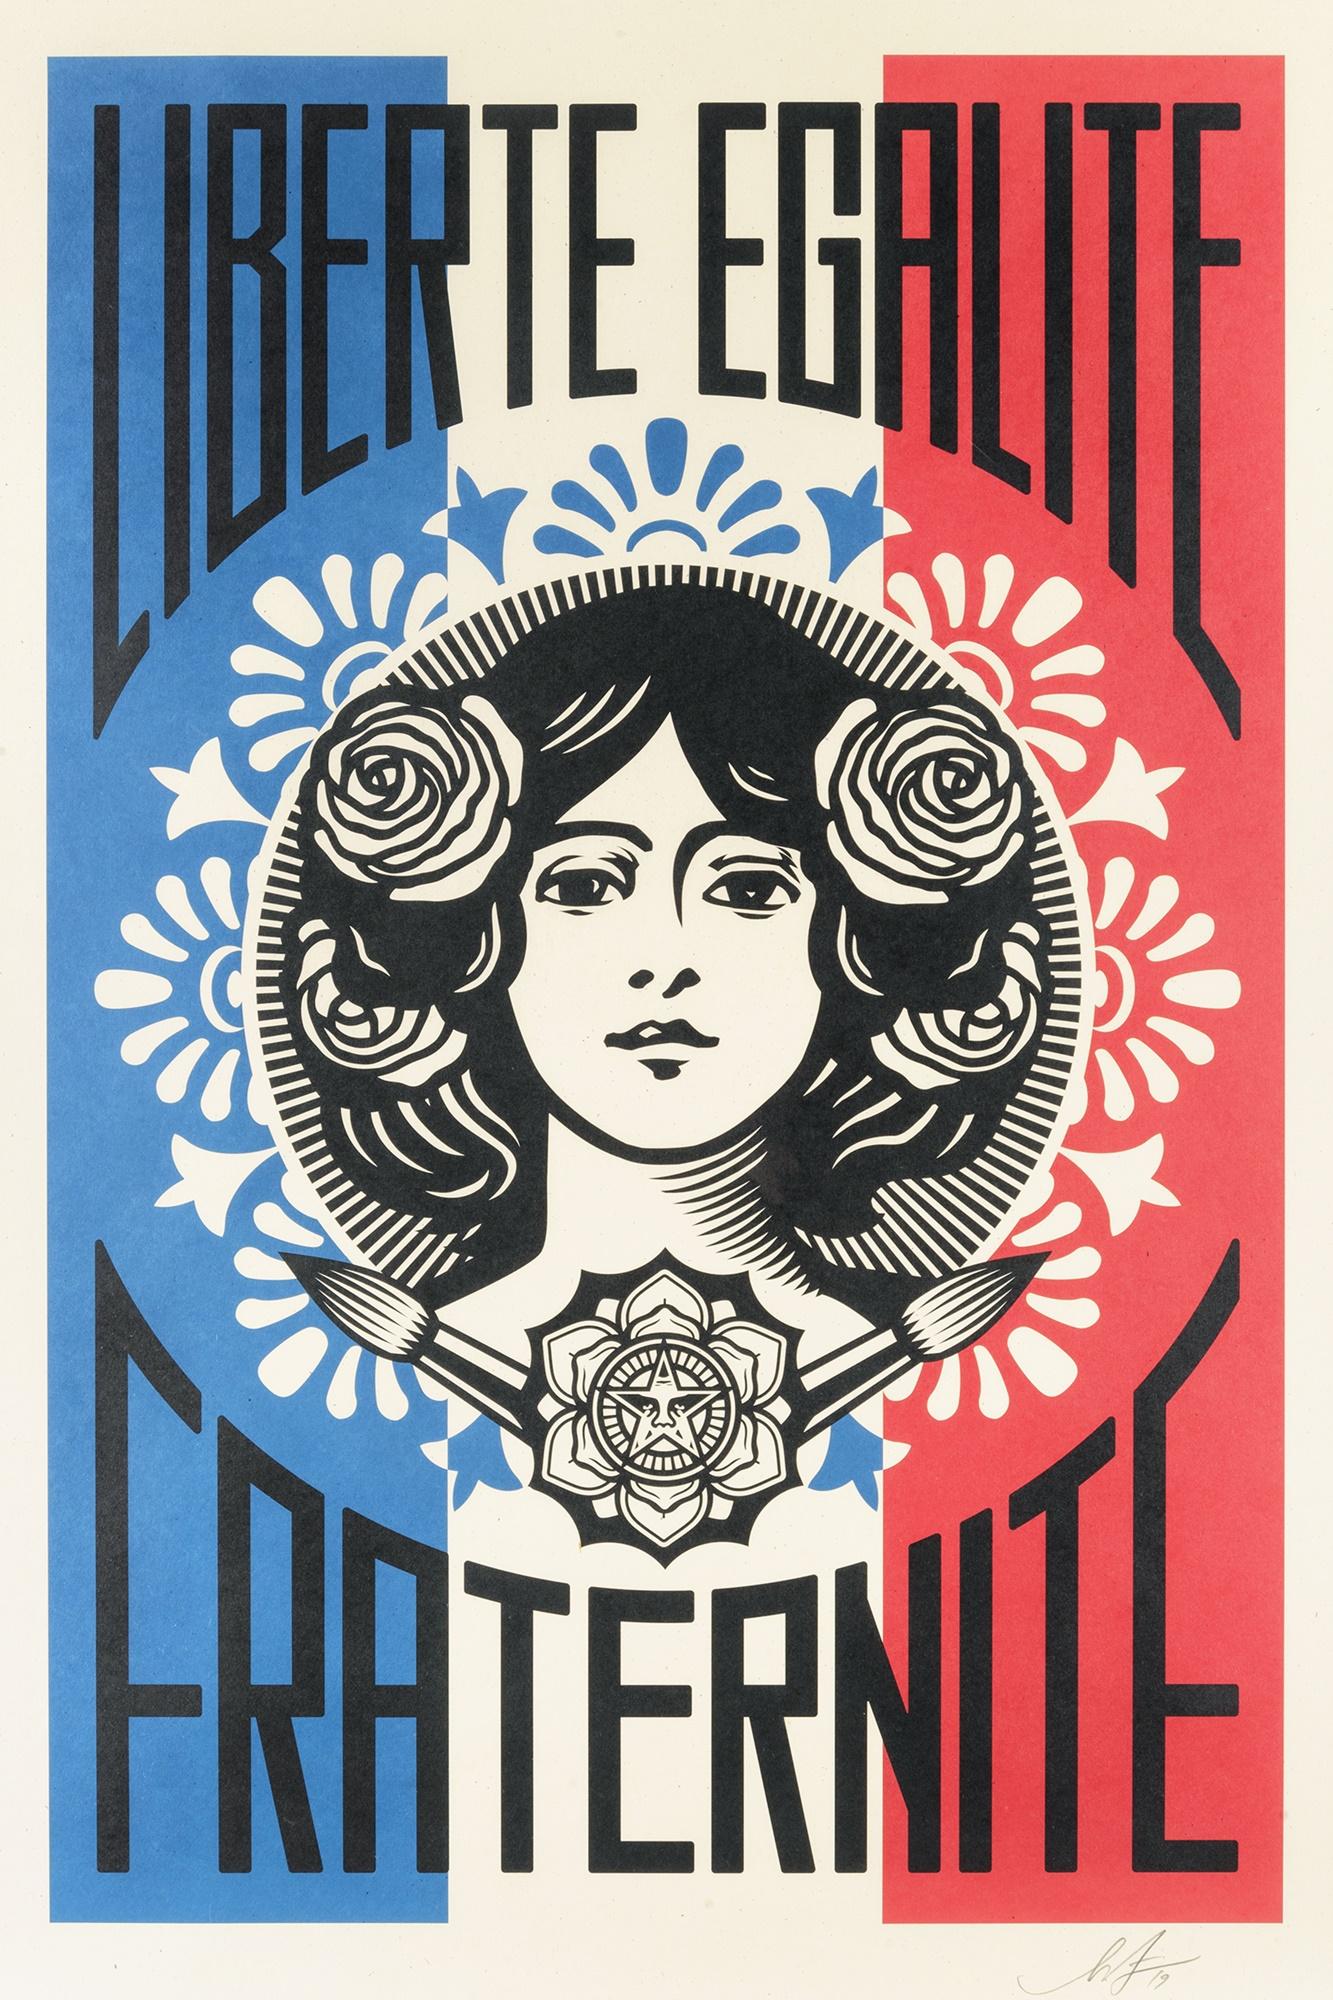 Shepard Fairey (American 1970-), 'Liberte, Egalite, Fraternite', 2018